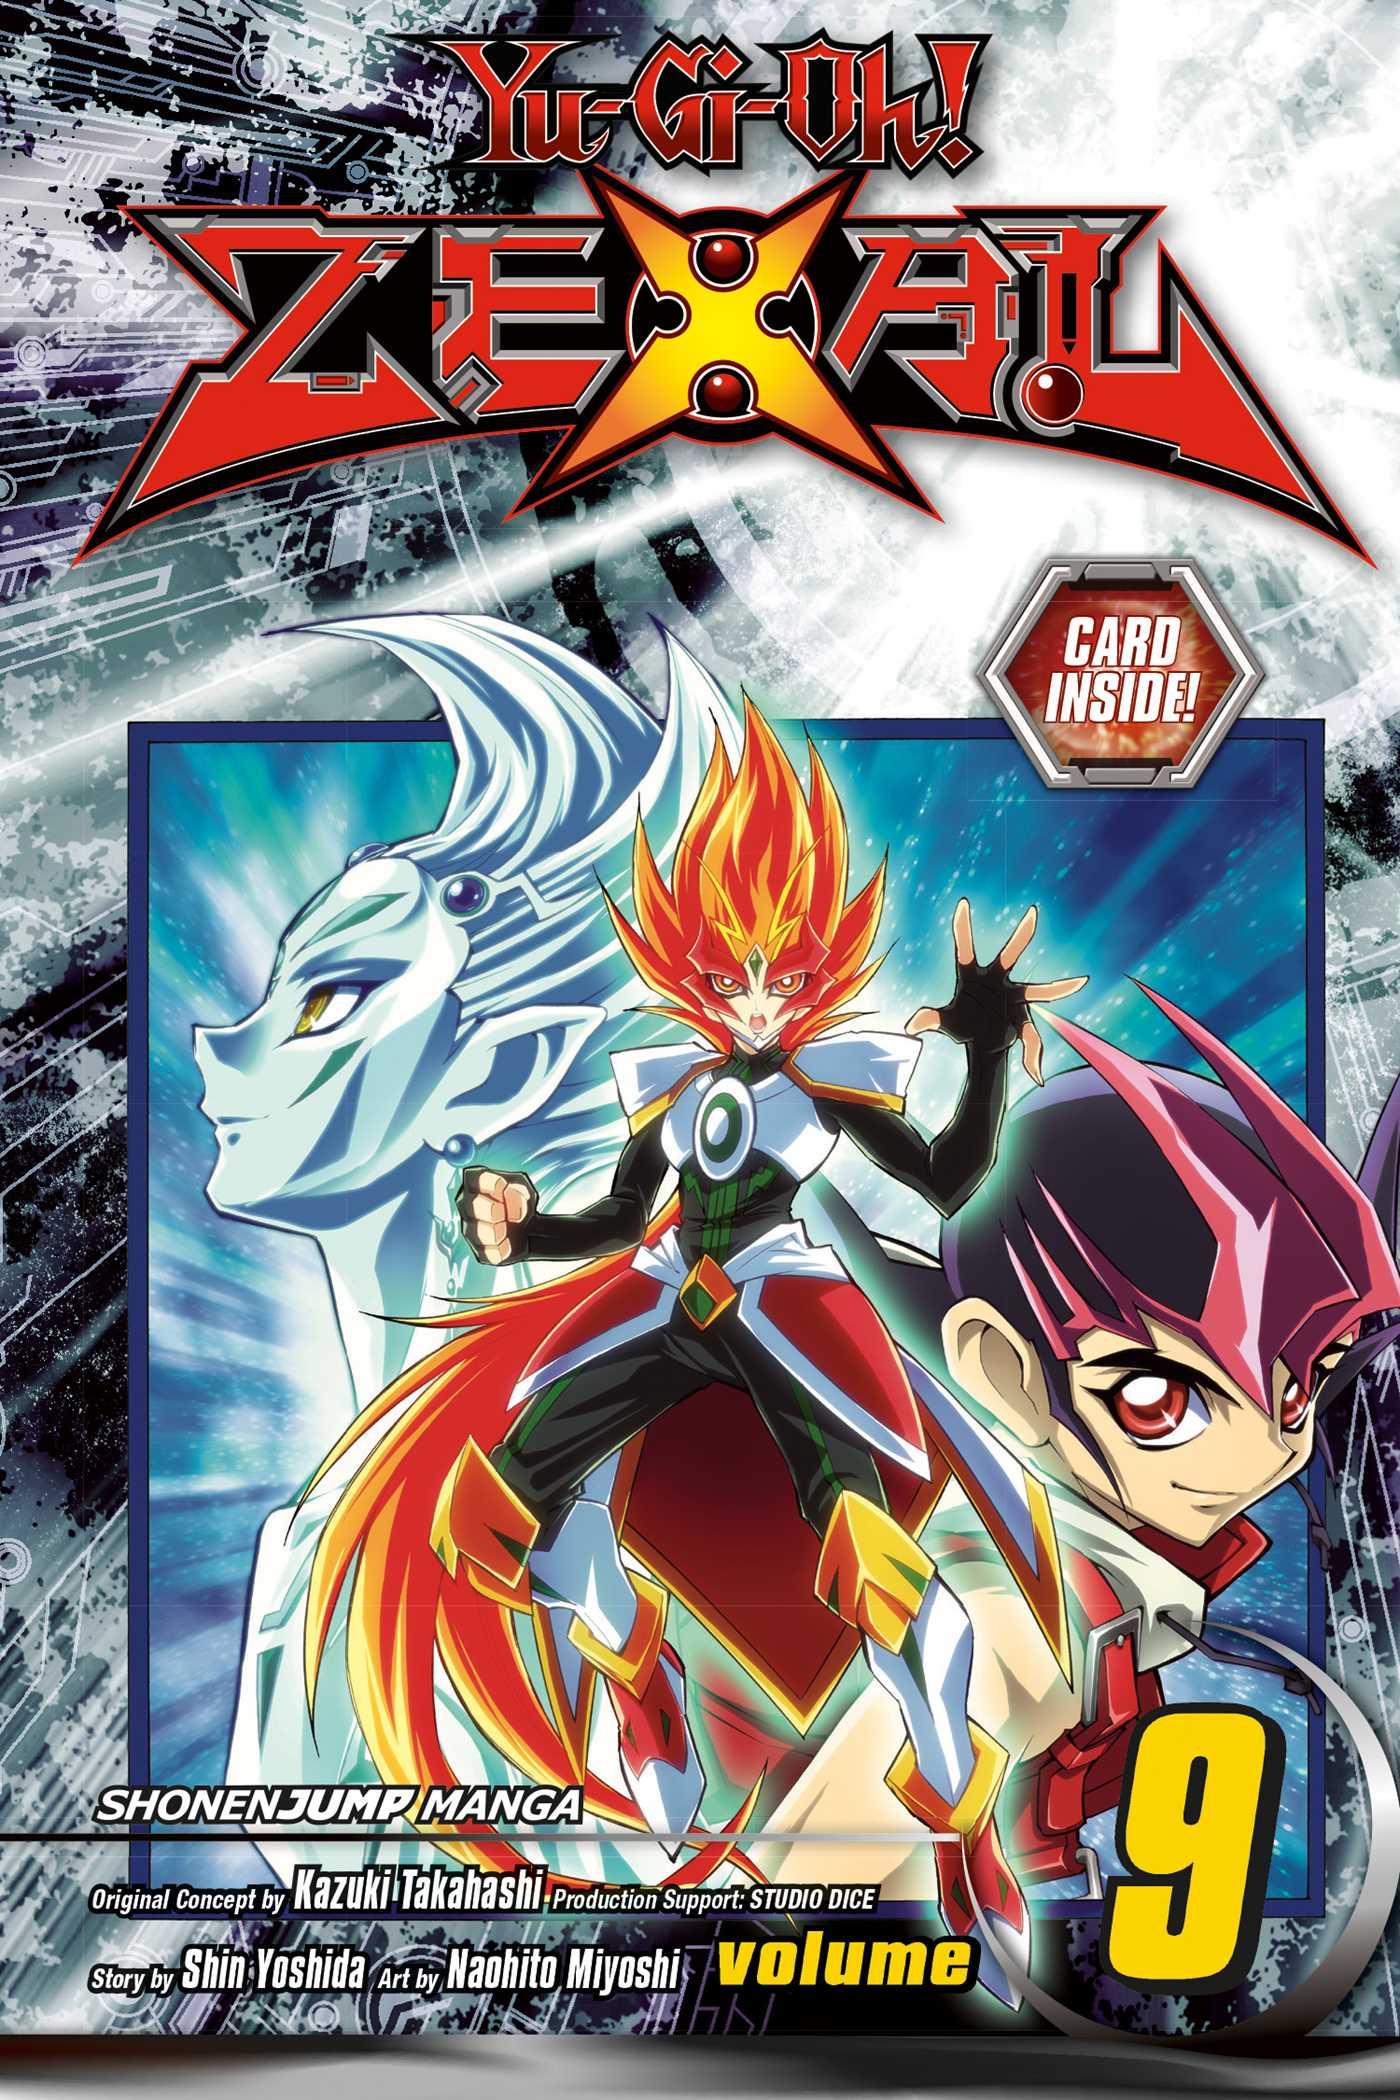 Yu-Gi-Oh! Zexal Manga Vol. 9 w/ TCG Card @Archonia_US